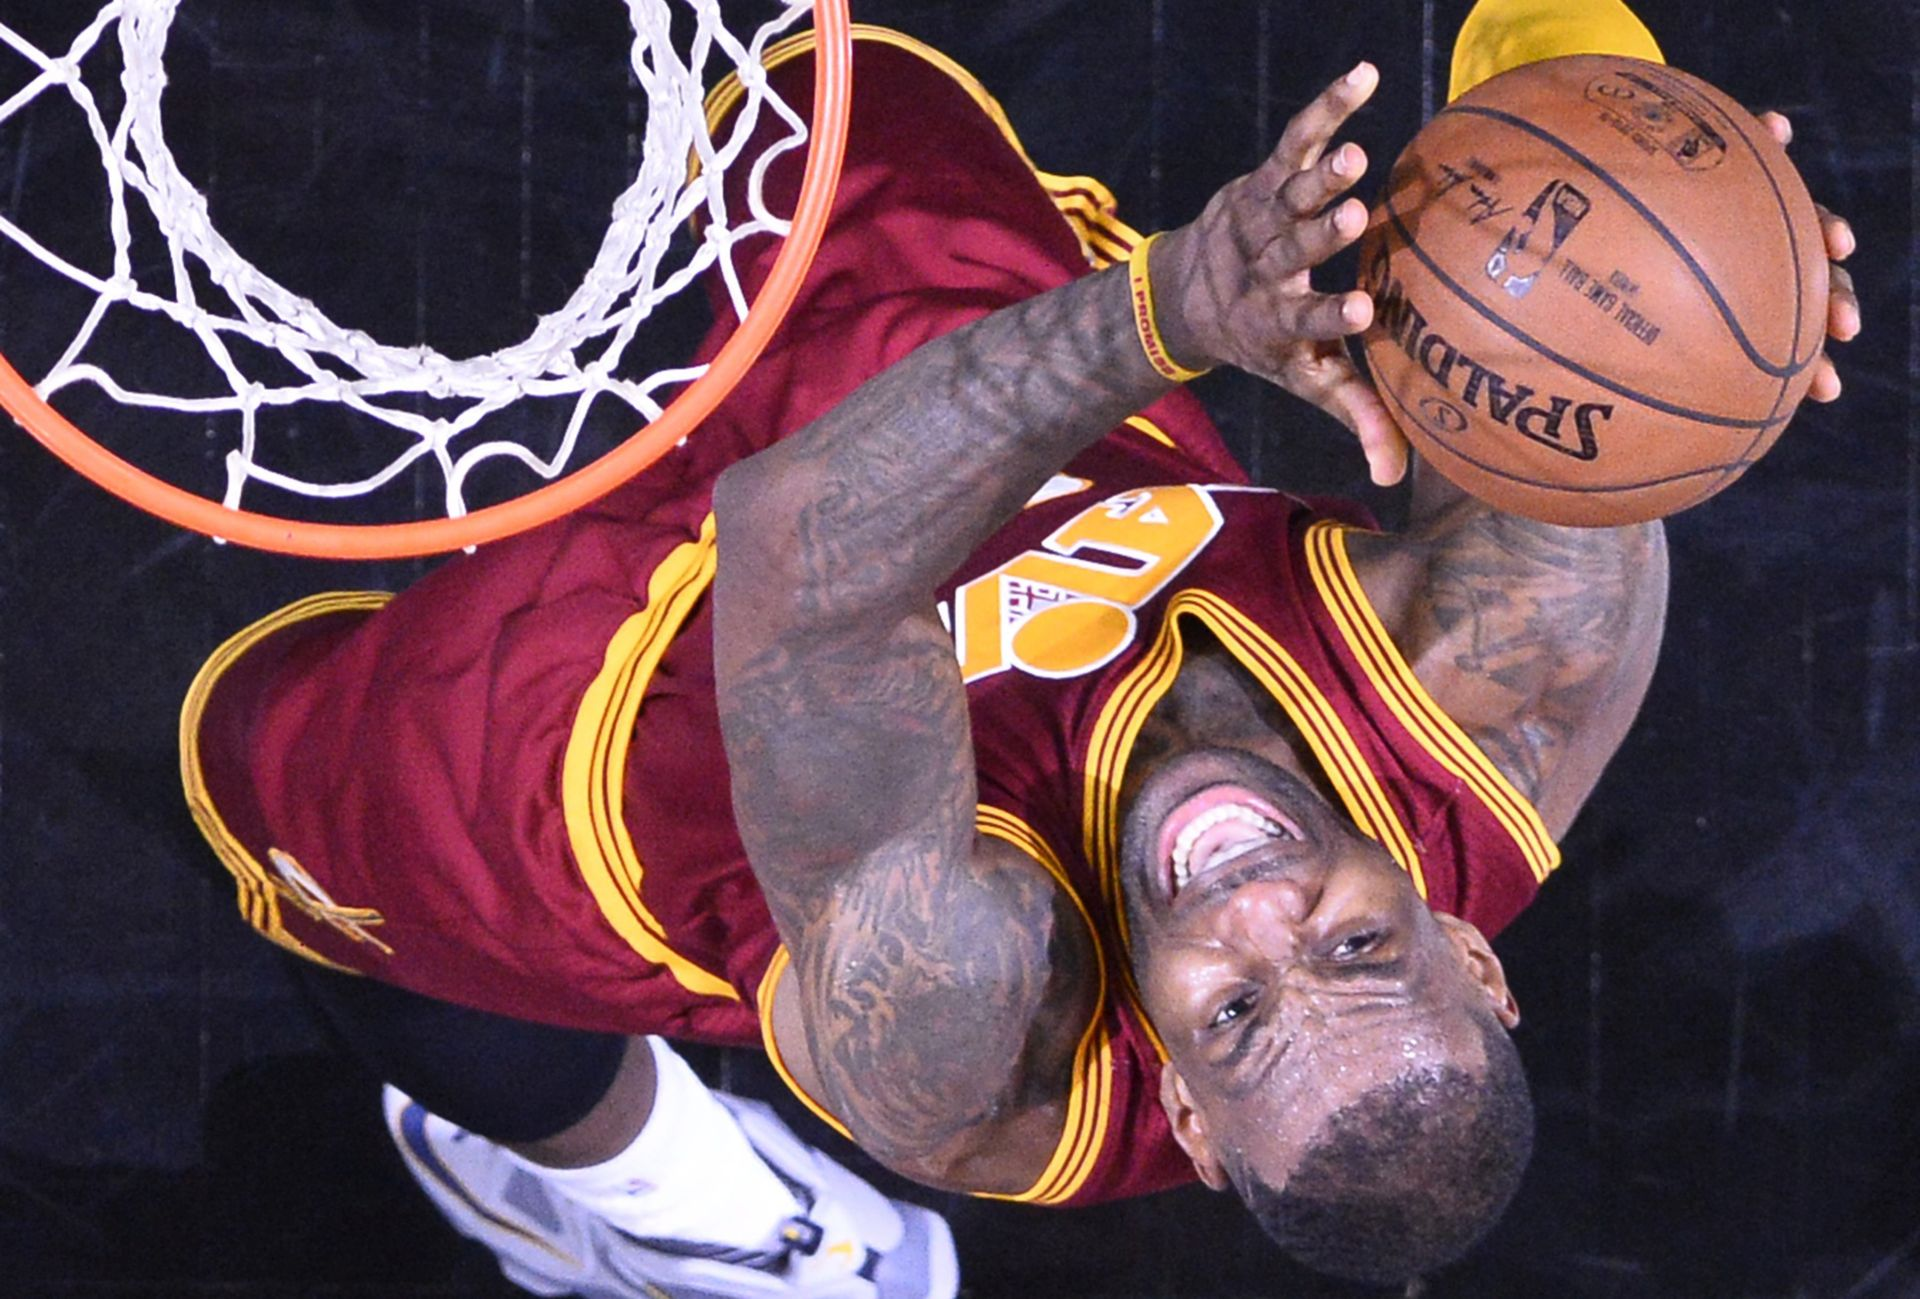 NBA: Spursima derbi protiv Clevelanda, Butler ubacio 53 koša